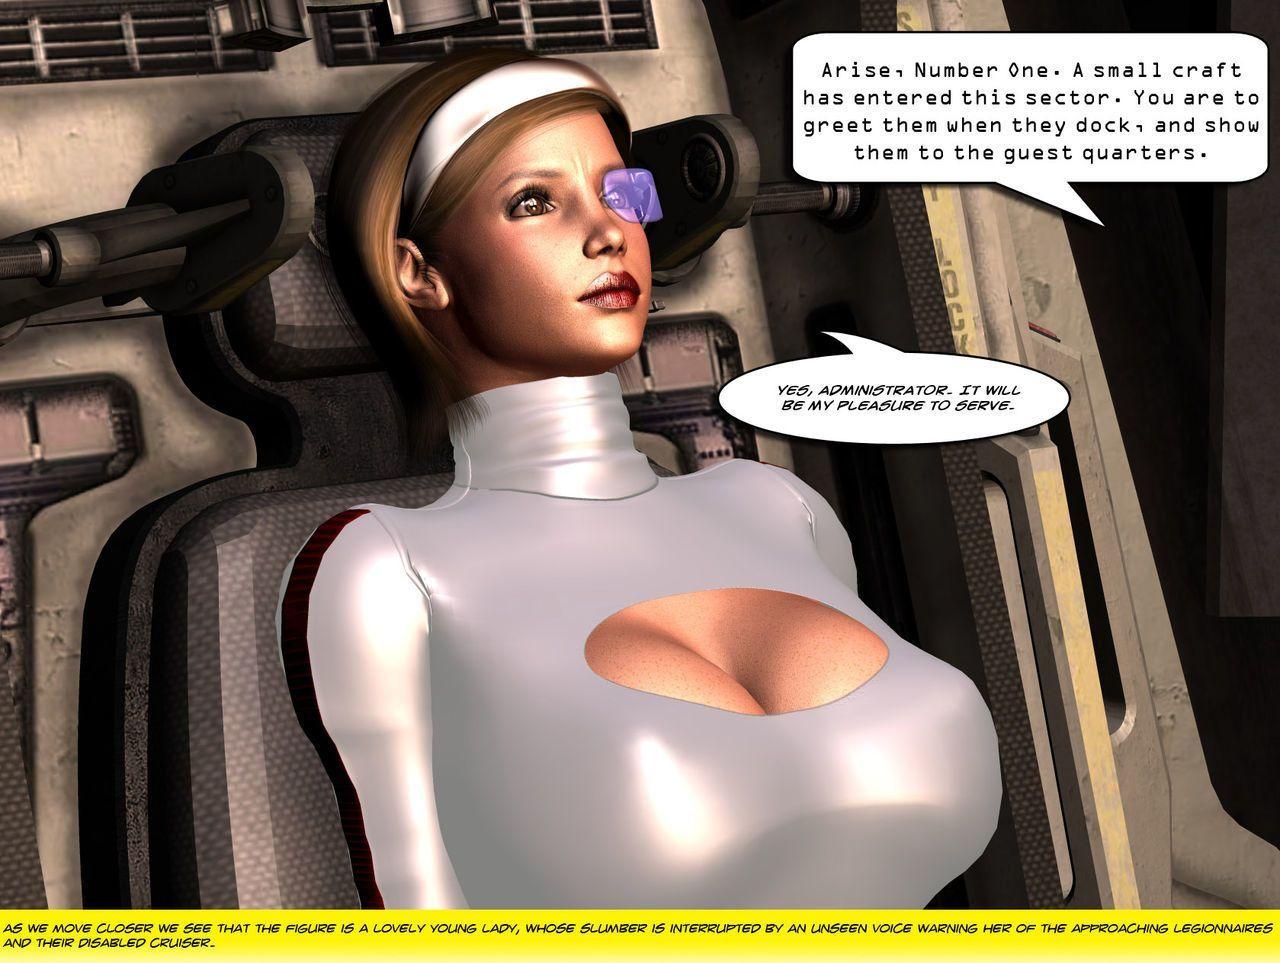 Space Station Venus 1 - 14